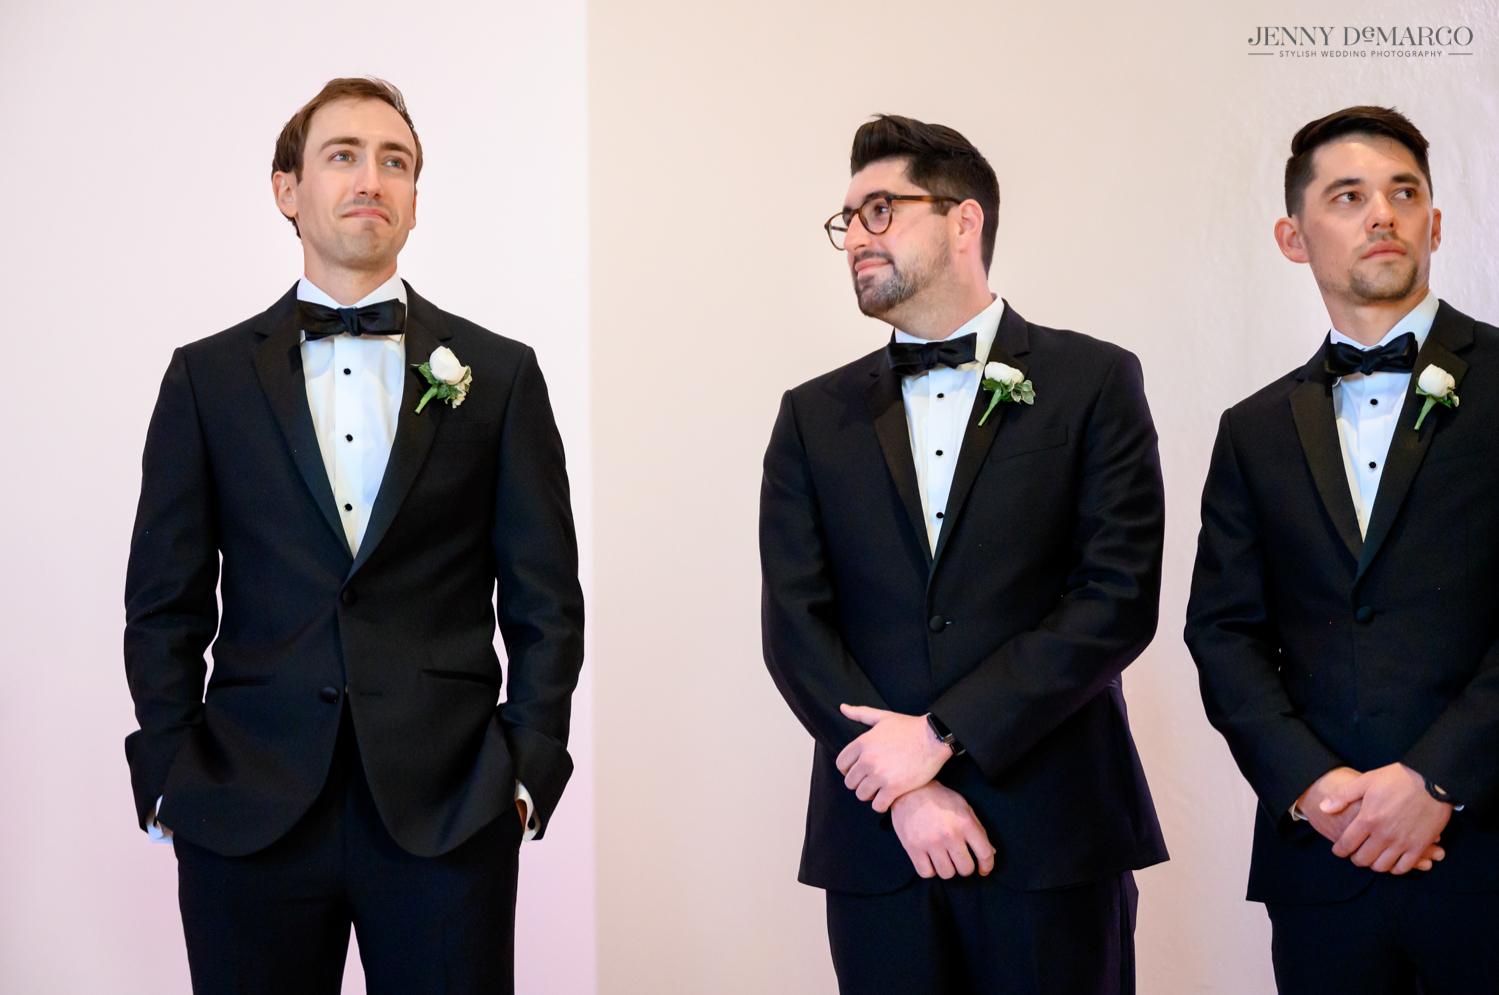 groom tearing up as he sees his bride walking down the aisle